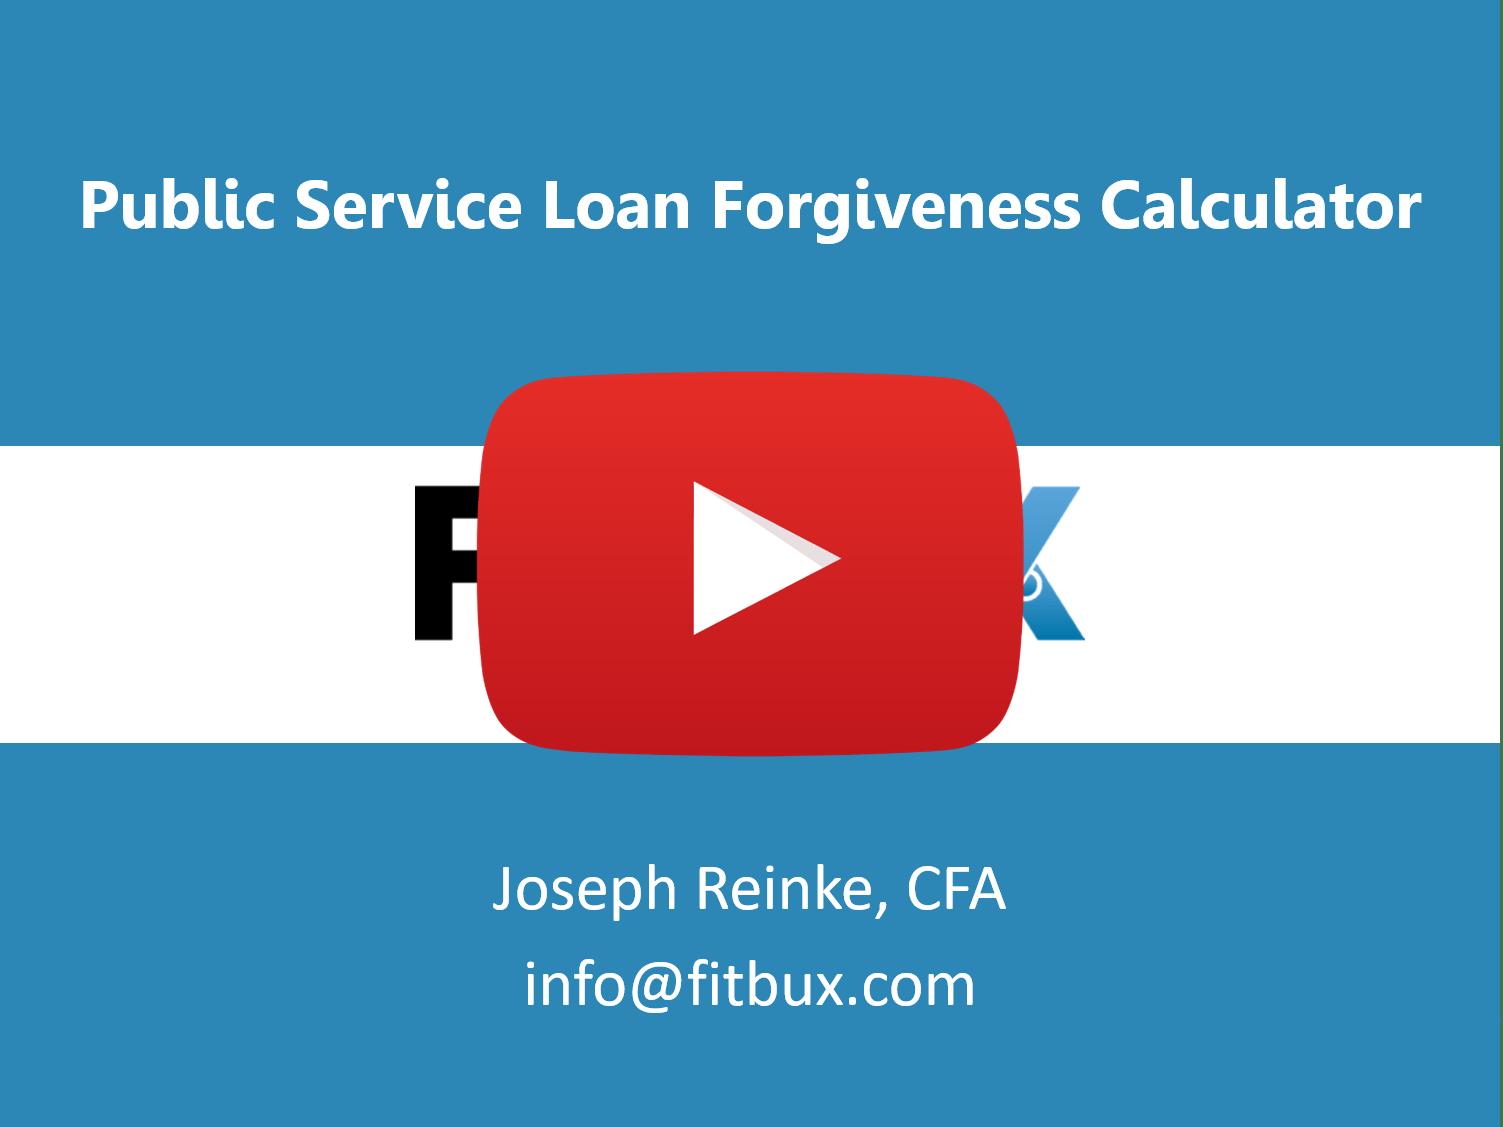 Public service loan frogiveness calculator video